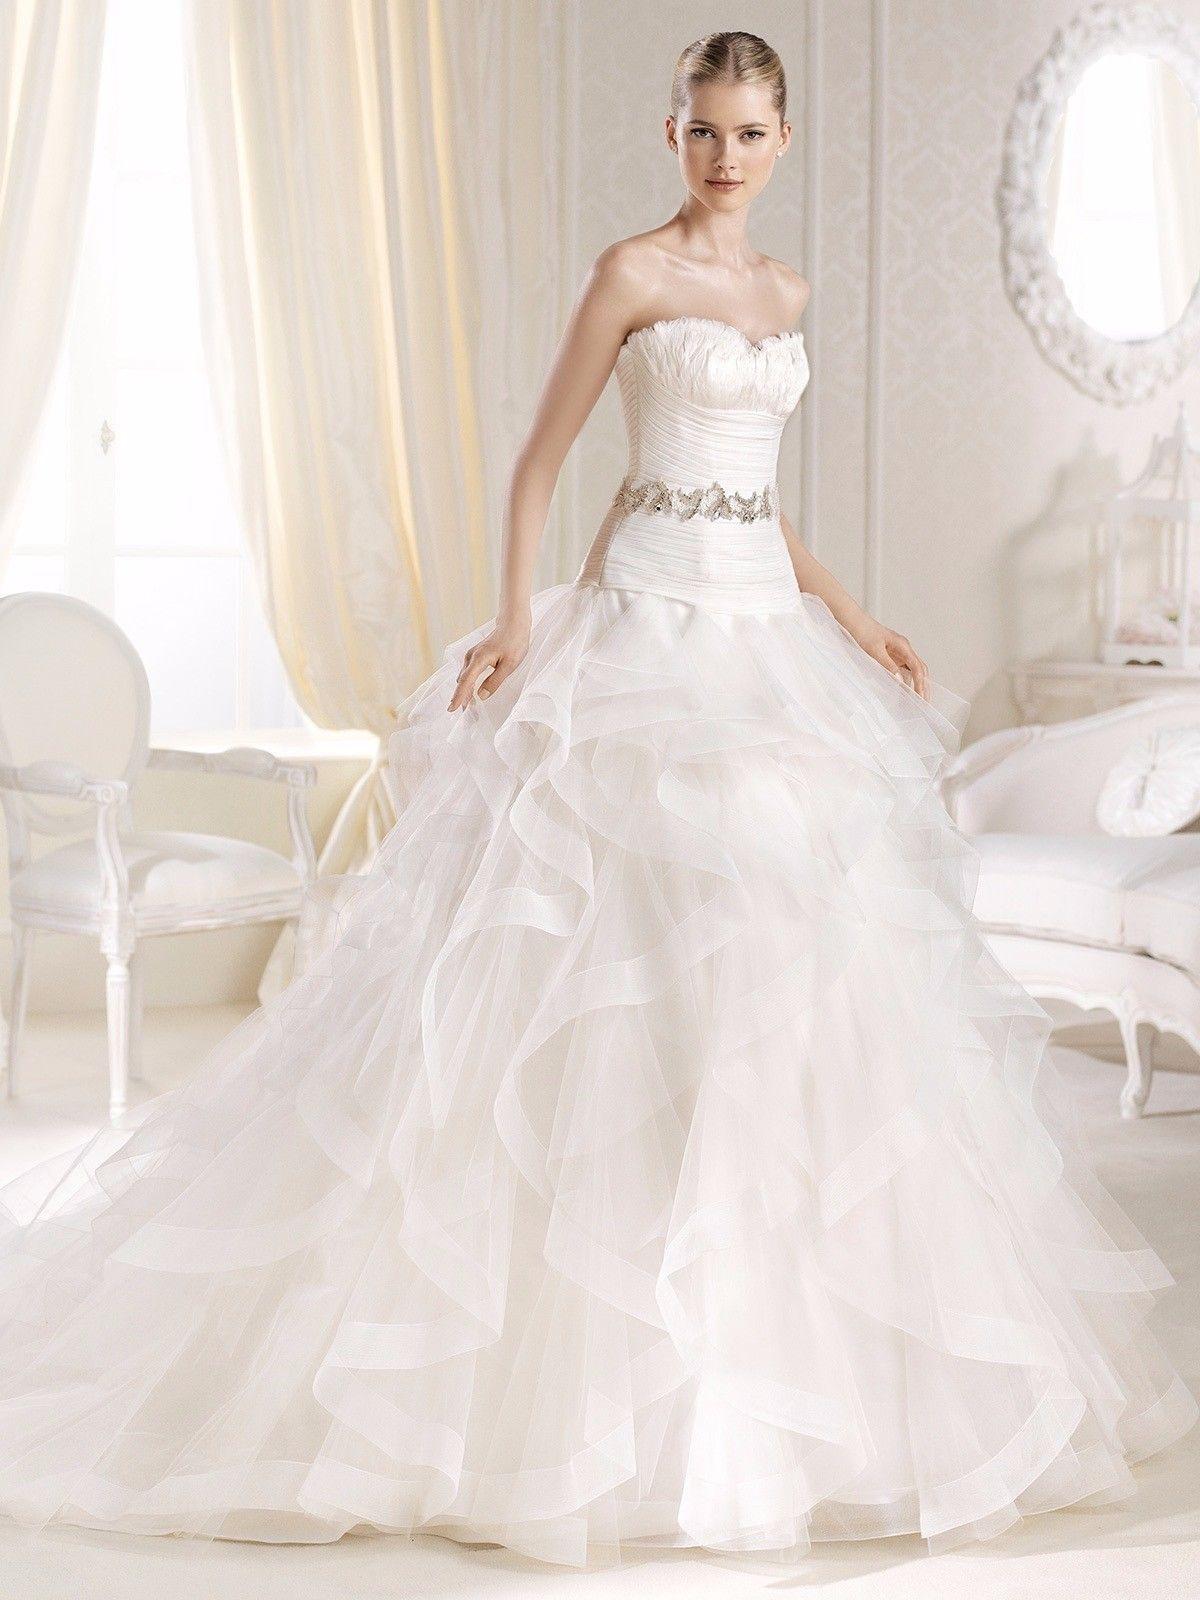 Used White Wedding Dress Luxury StyleLa Sposa by Pronovias size 6-8 https://t.co/v5cCG9940y https://t.co/yajpHKmy2z